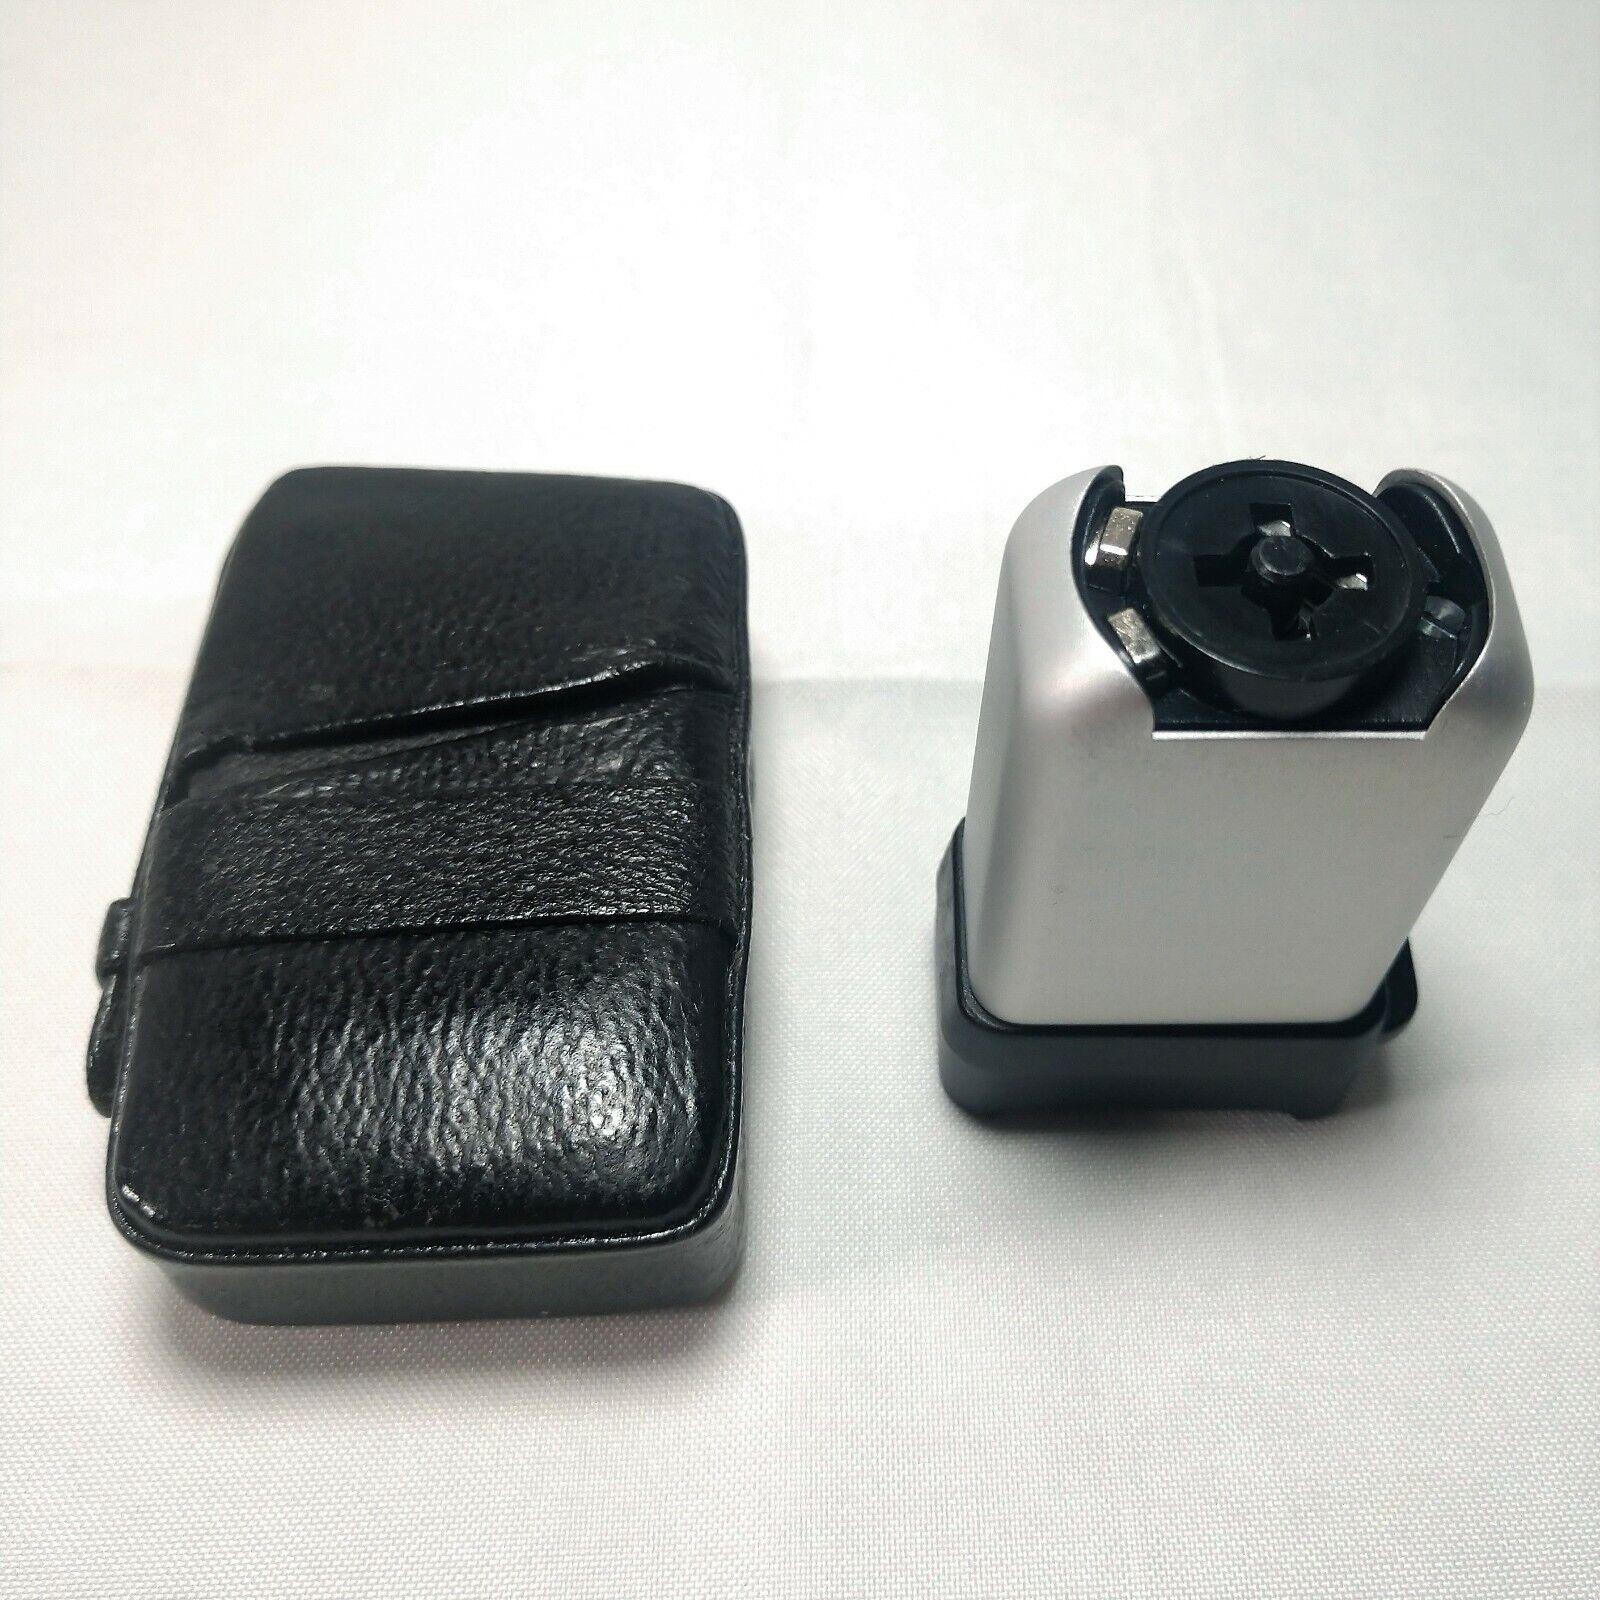 MINOX Cube Flasher FL4 Chrome Flashgun Subminiature 8x11 German Spy Camera Flash